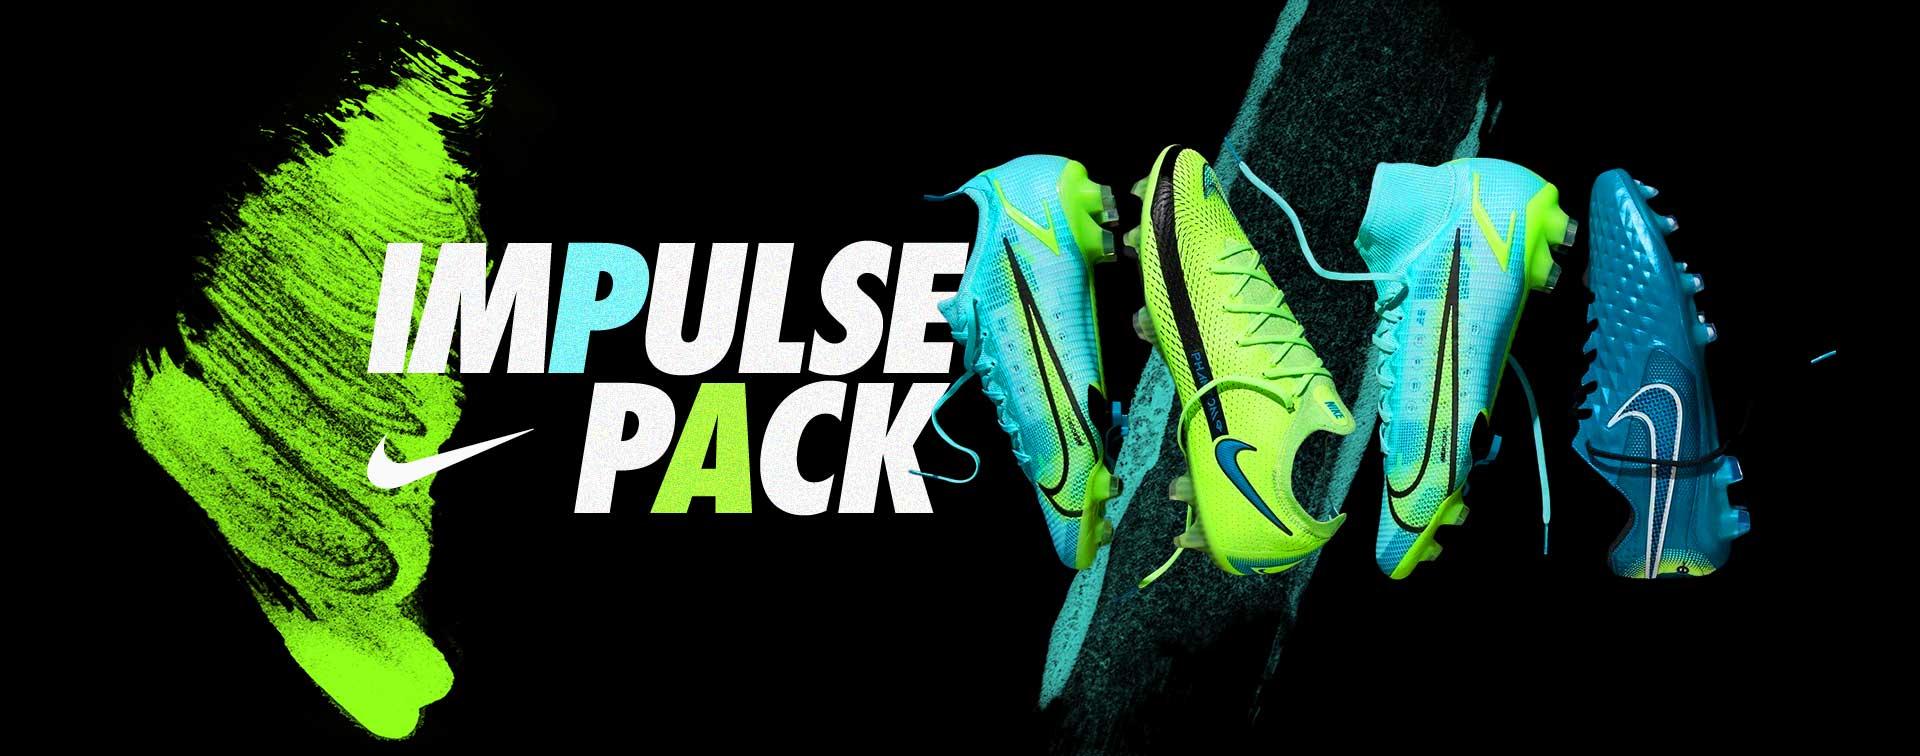 Nike Impulse